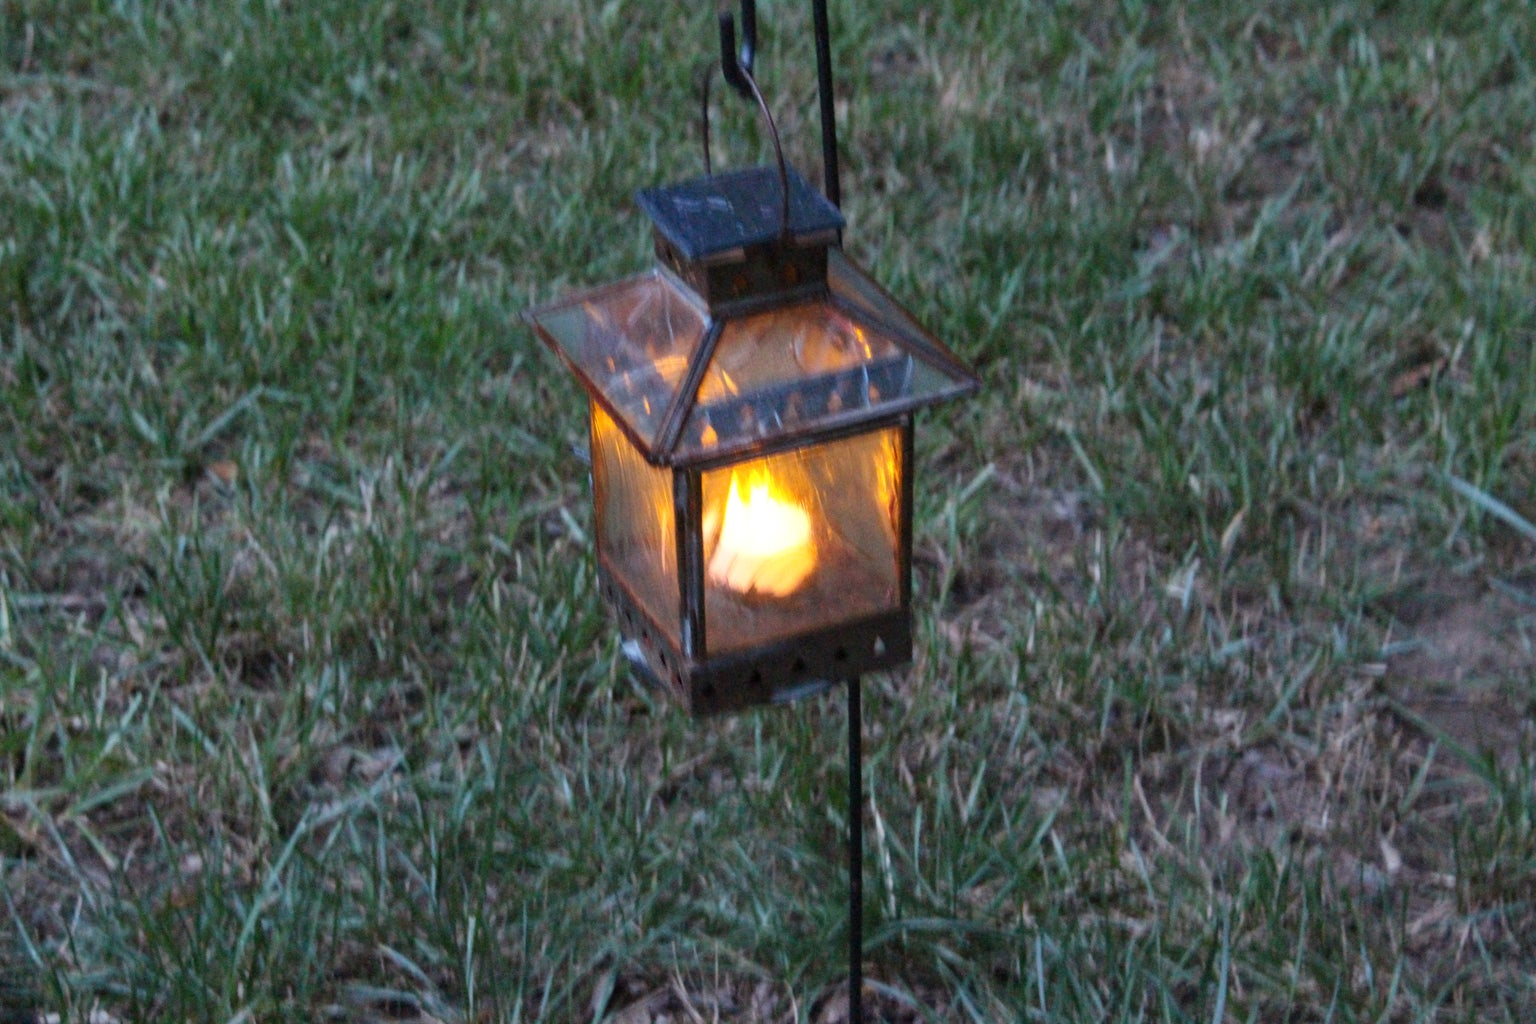 Converting Old Tea Light Lanterns Into Romantic Solar Garden Lights